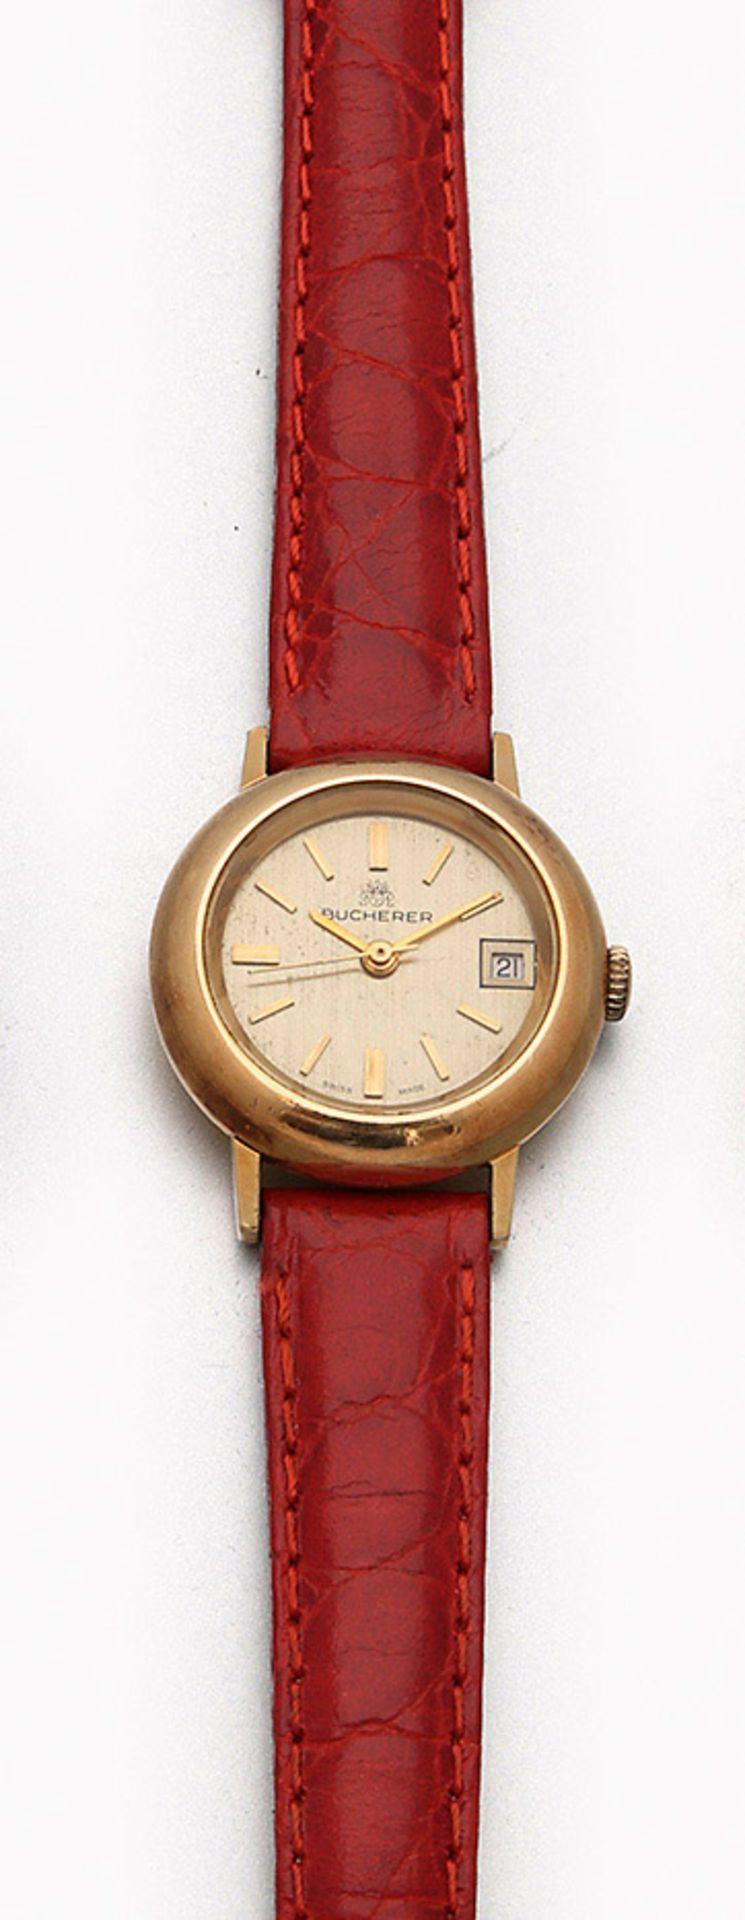 Bucherer-Damenarmbanduhr aus den 70er Jahren